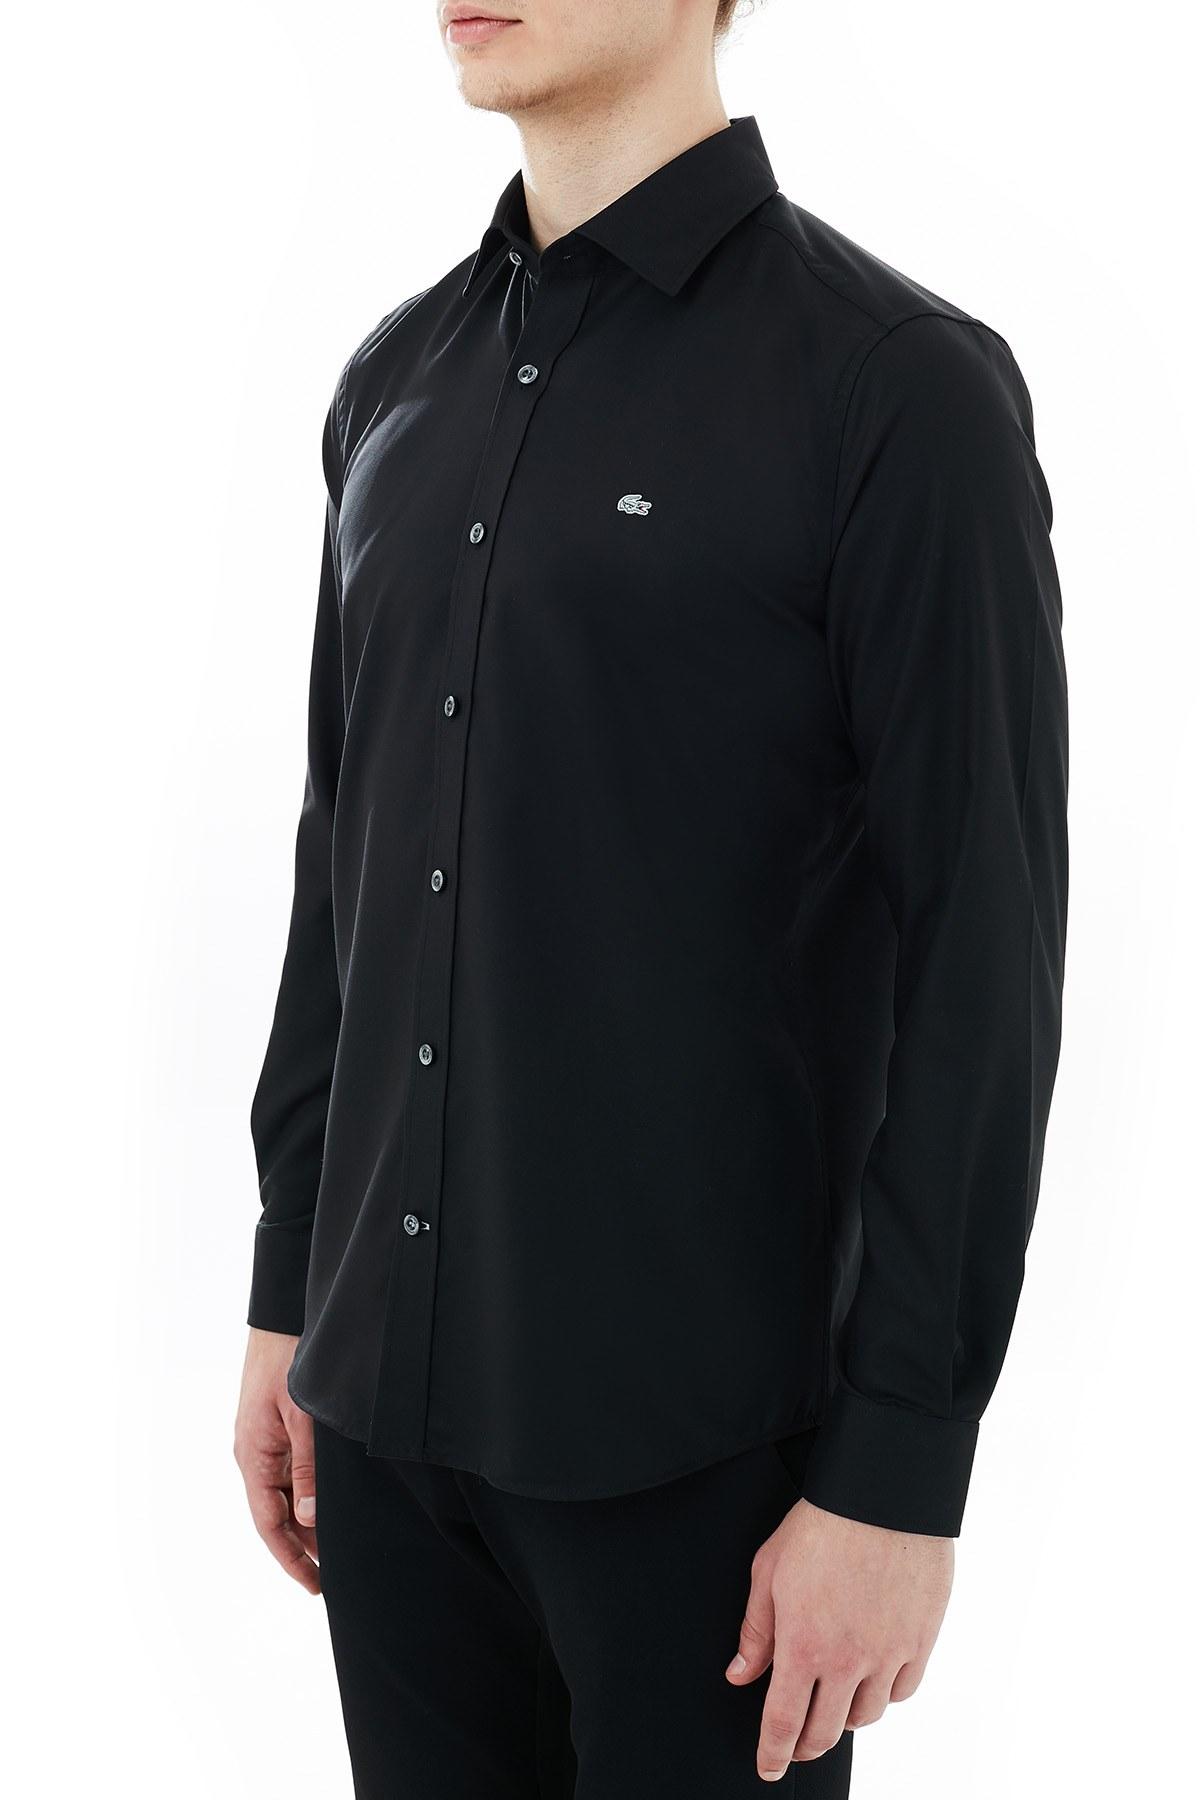 Lacoste Düz Yaka % 100 Pamuk Erkek Gömlek CH6122 C31 SİYAH